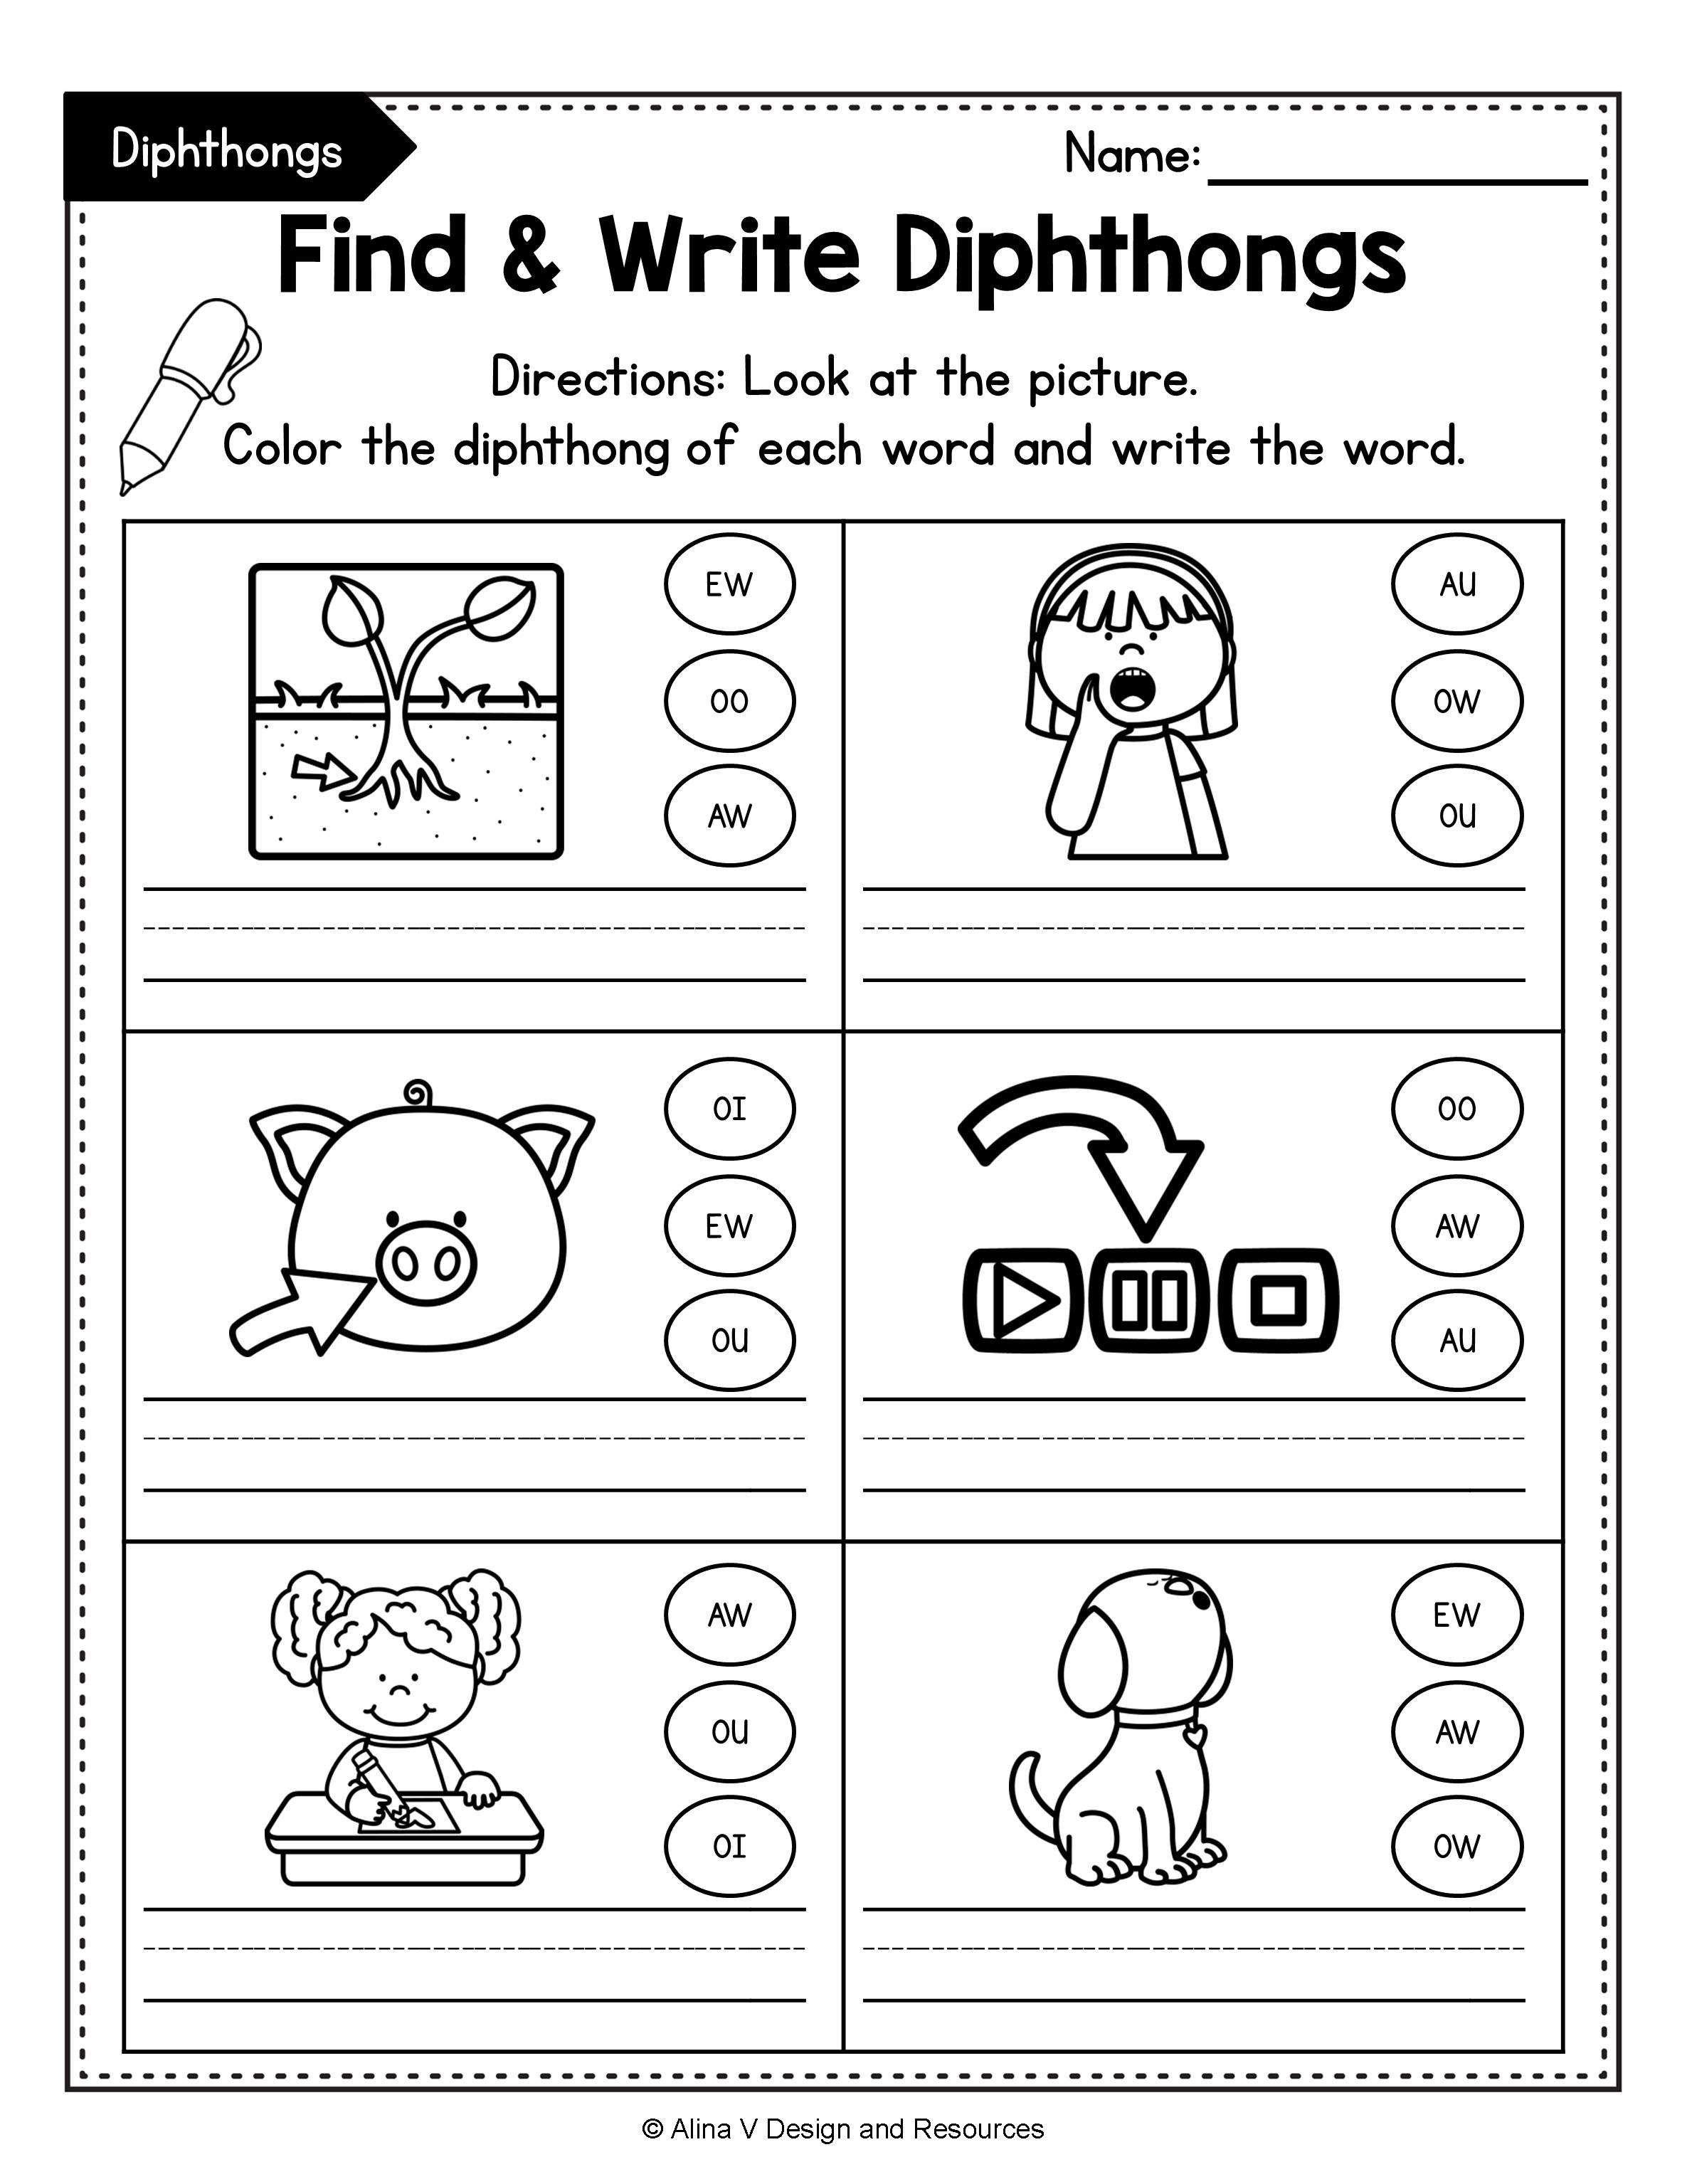 Diphthong Activities Bundle Diphthong Activities Vowel Diphthongs Worksheets In 2020 2nd Grade Activities Kindergarten Resources 1st Grade Activities